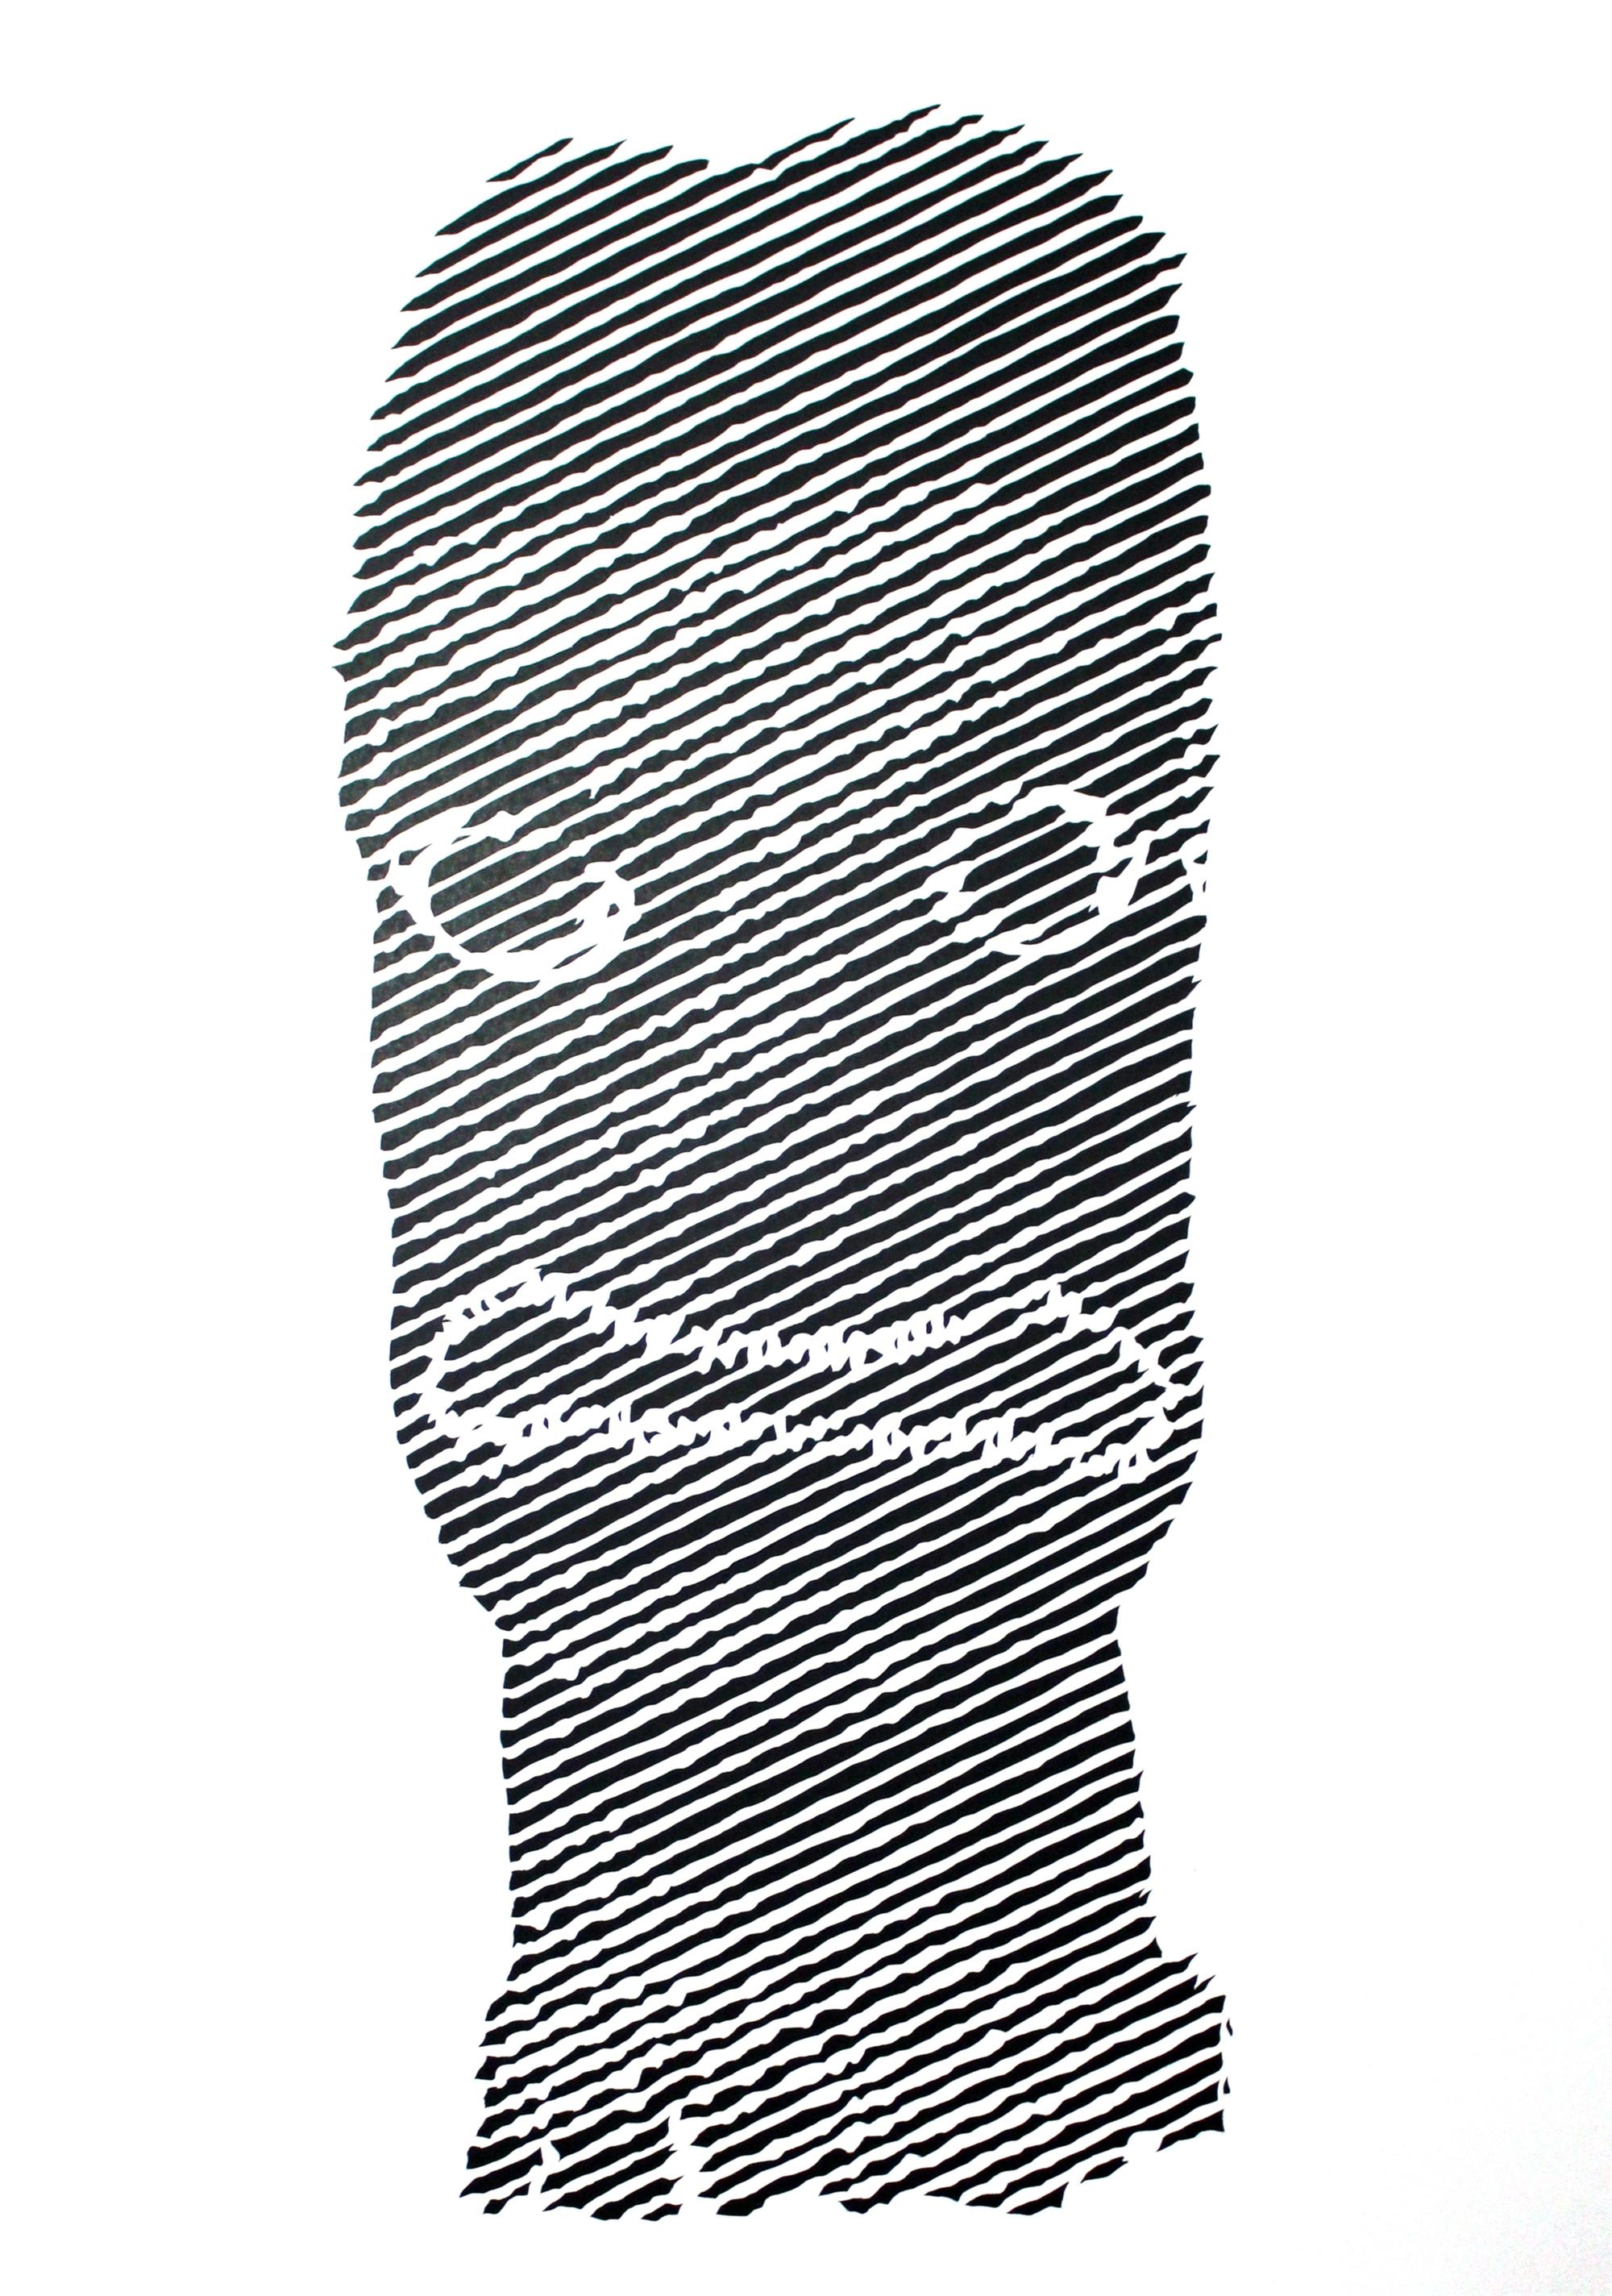 Akua Hulu Manu/Feathered God #4 by Ian Kuali'i